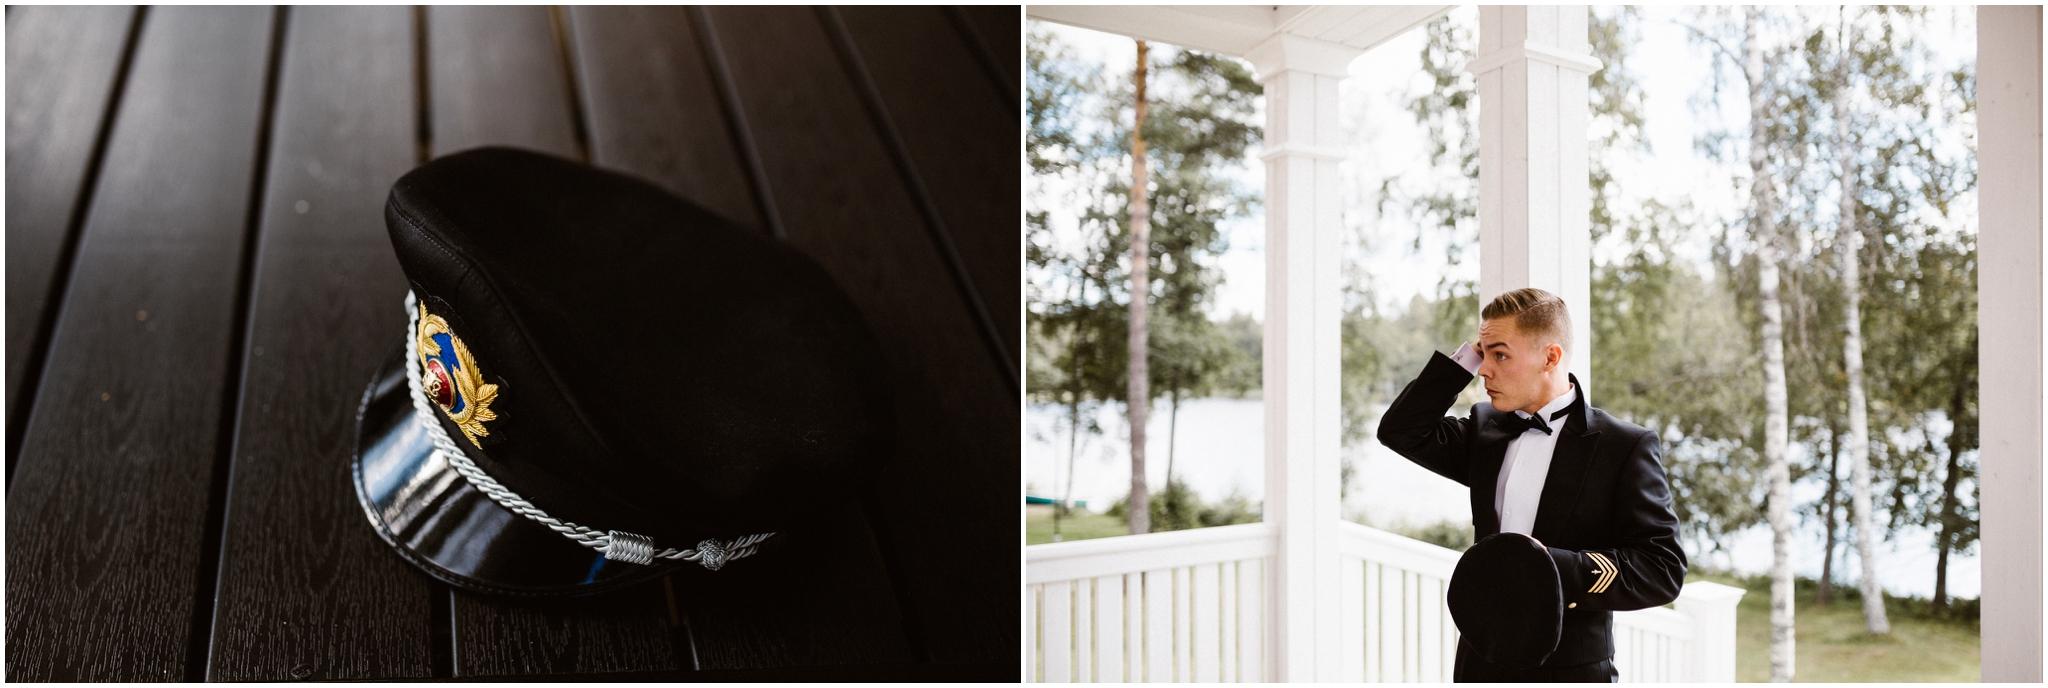 Pinja + Marko -- Patrick Karkkolainen Wedding Photographer-1.jpg